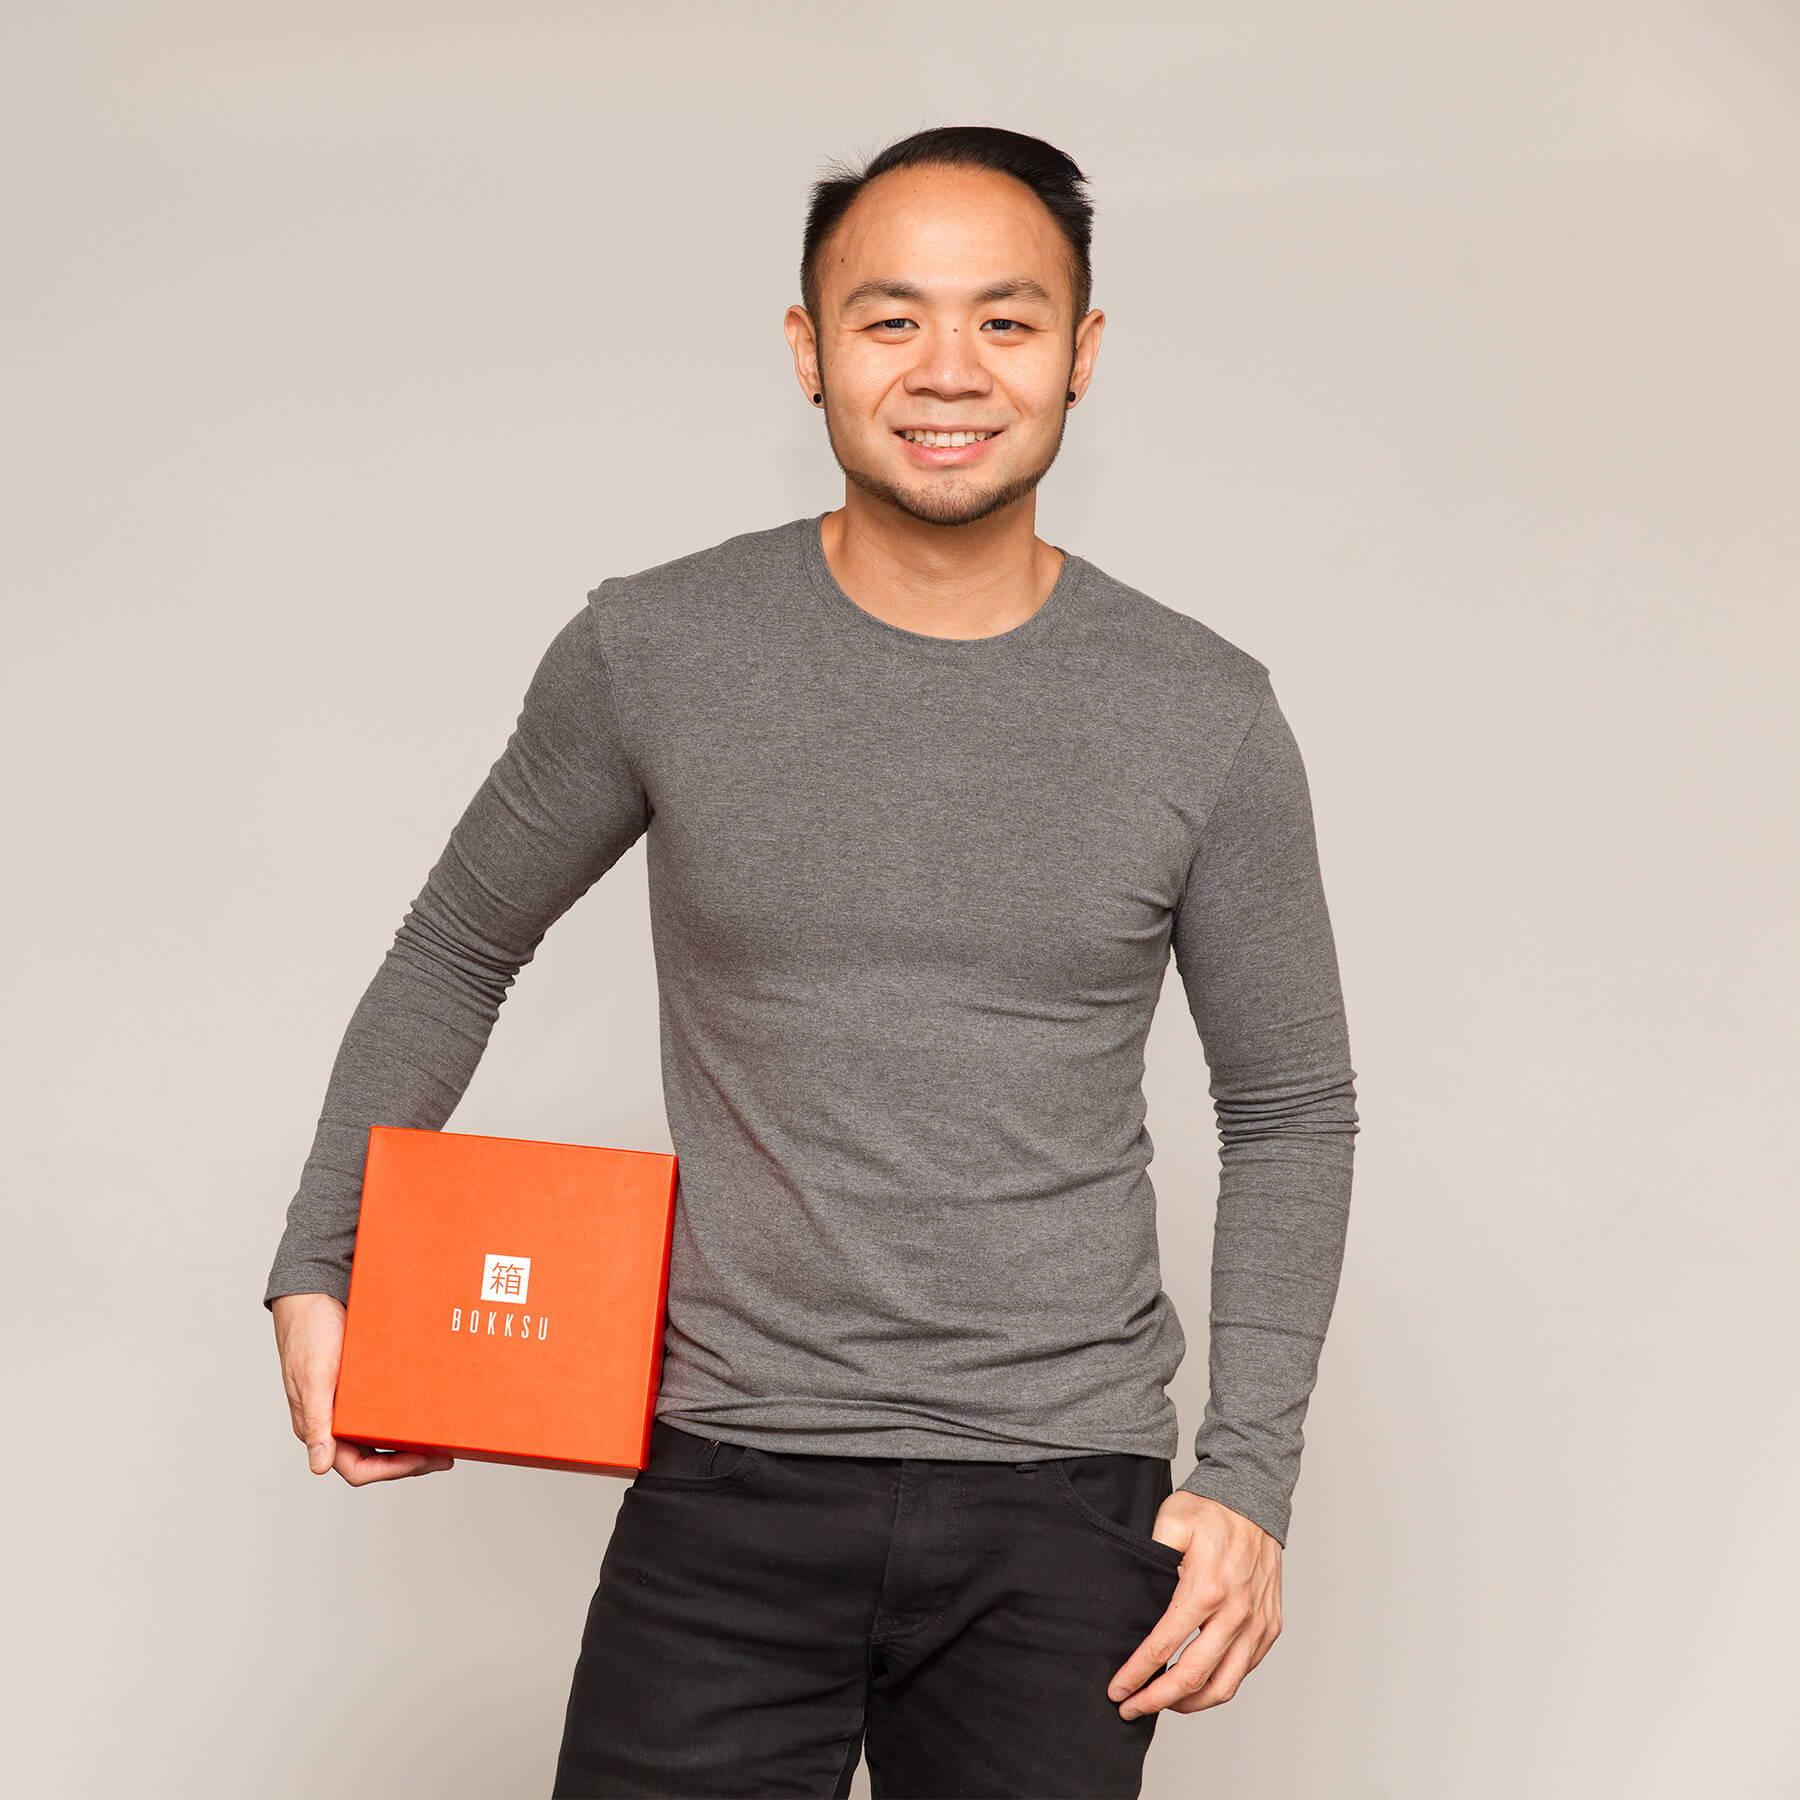 Bokksu Founder Danny Taing